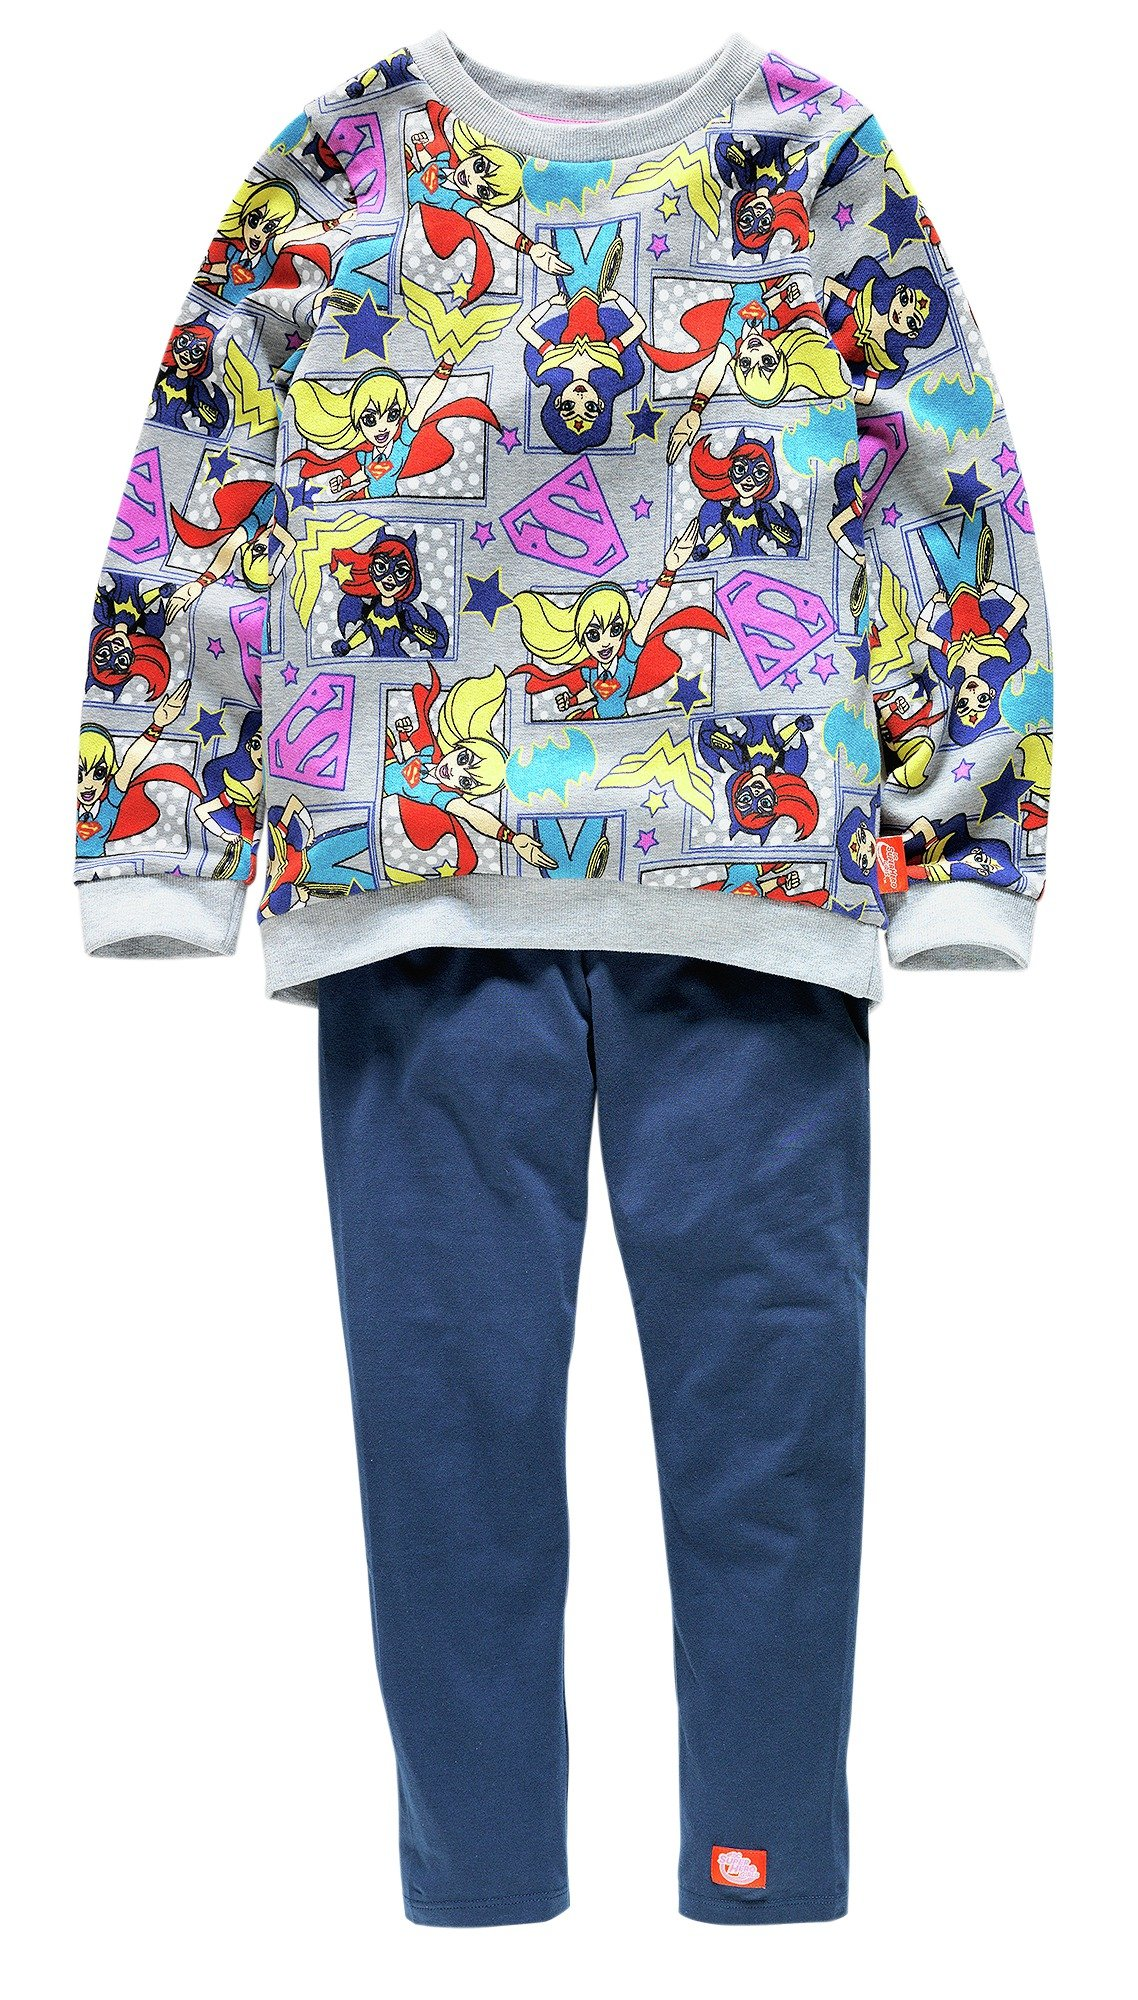 Image of DC Supergirl Sweatshirt & Leggings Set - 5-6 Years